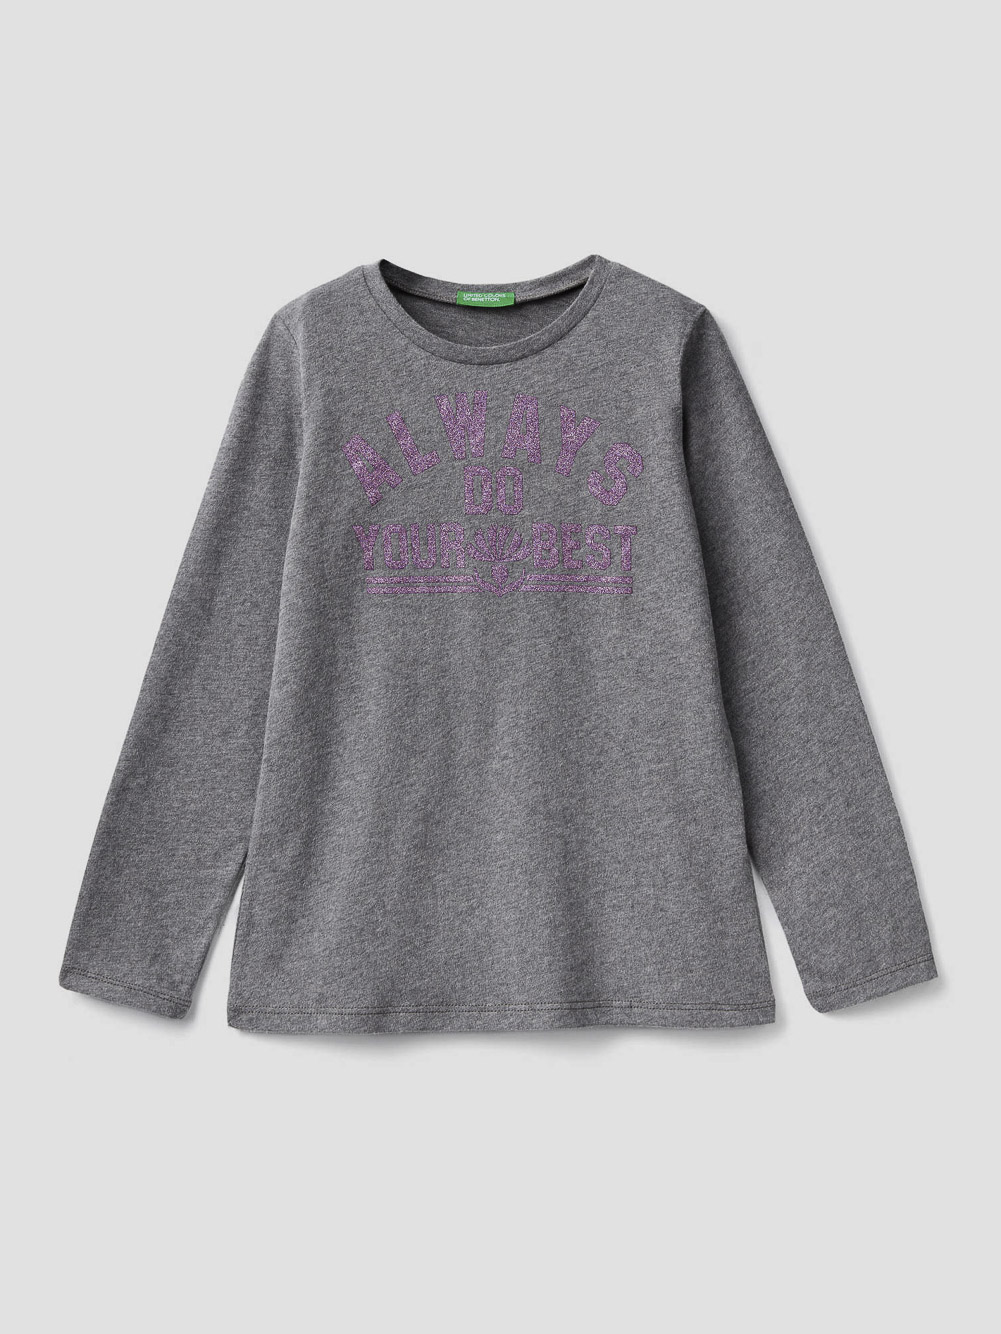 012 BENETTON T-shirt με glitter τύπωμα 3VR5C14Y4 20A507